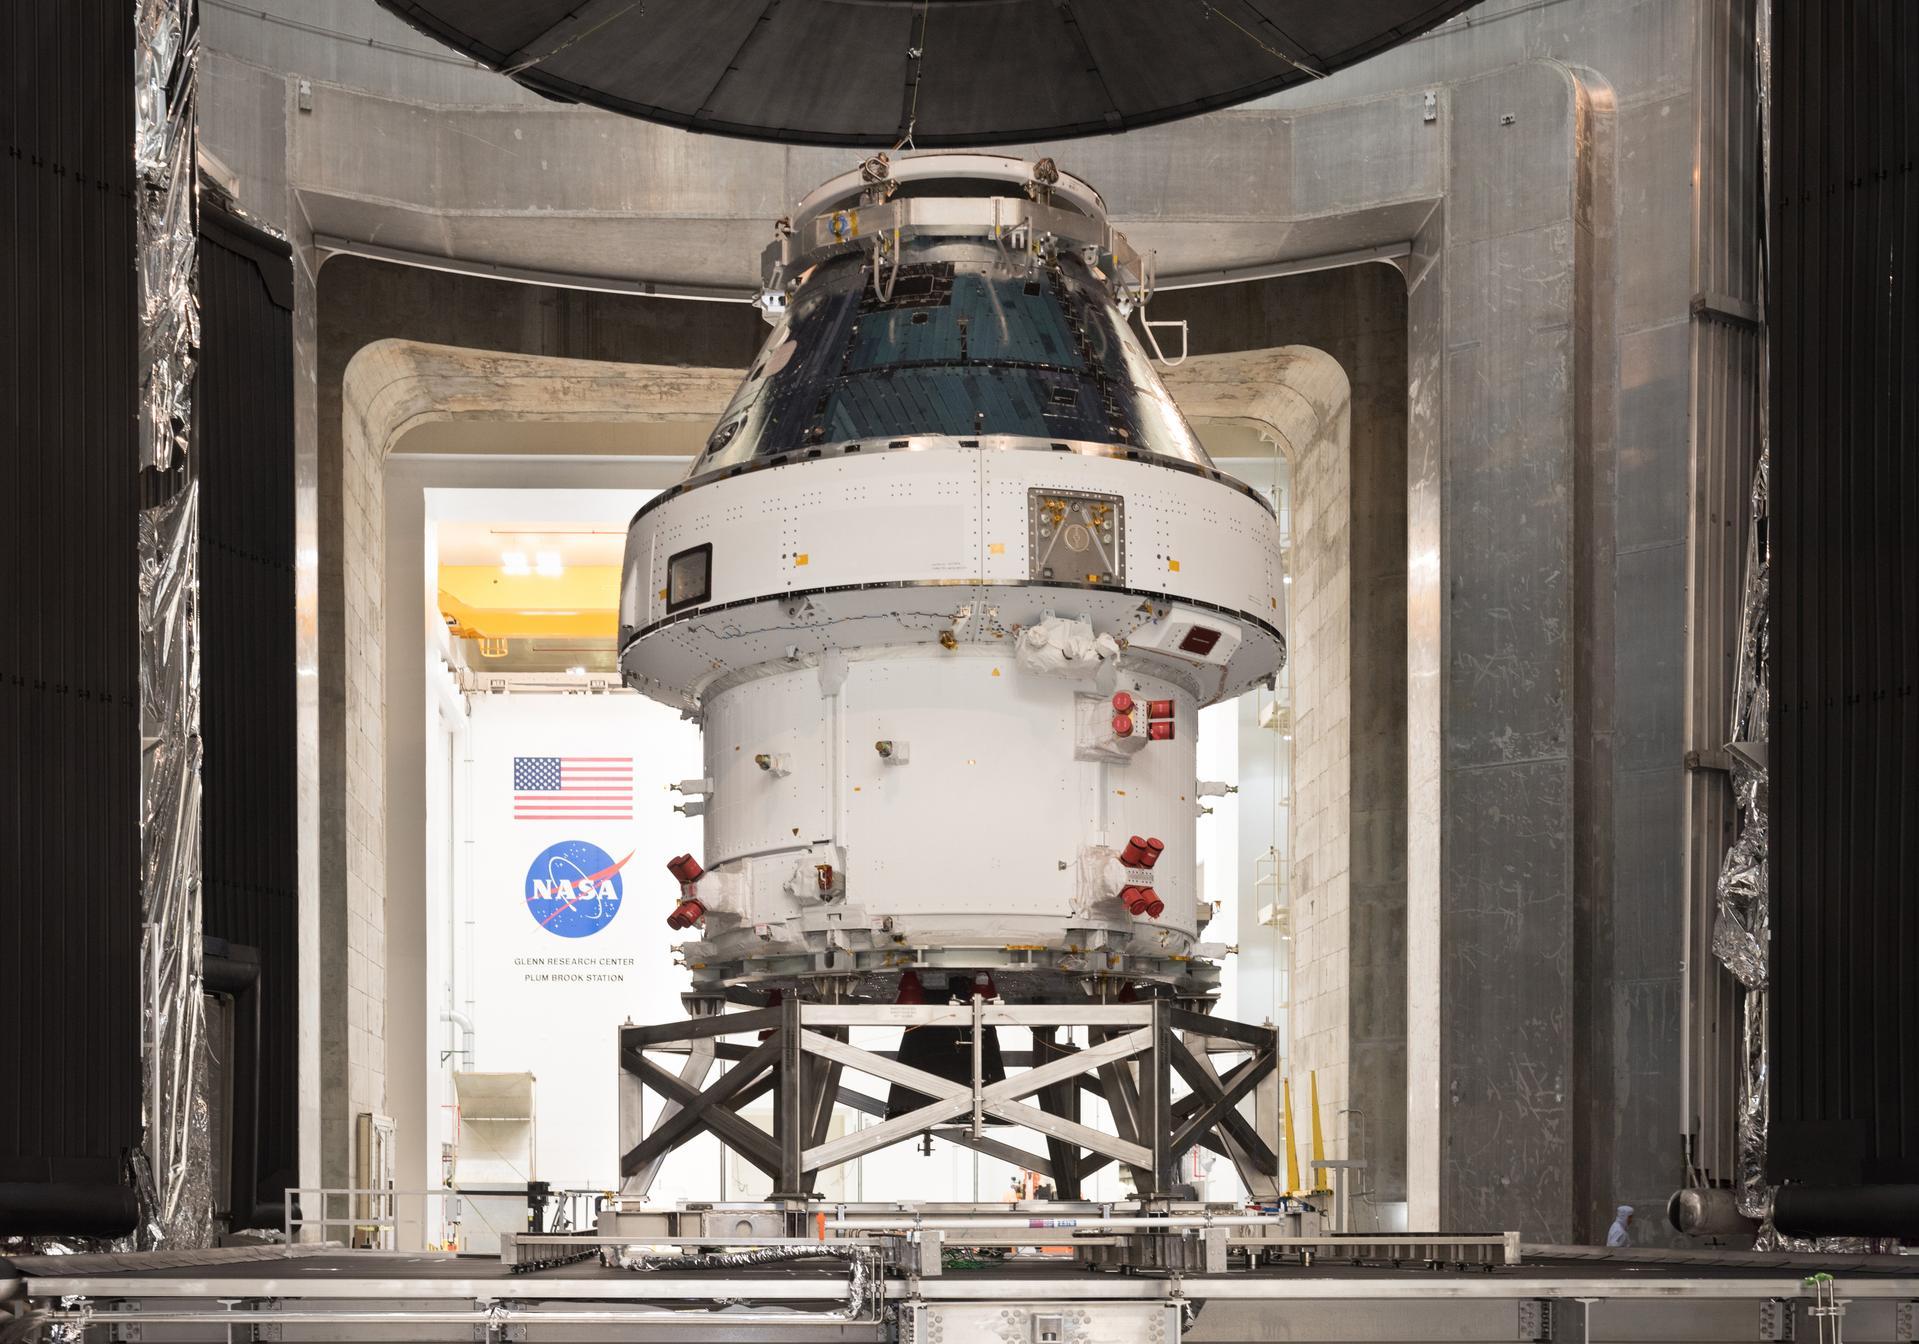 Artemis 1 Orion returns to KSC after Plum Brook testing